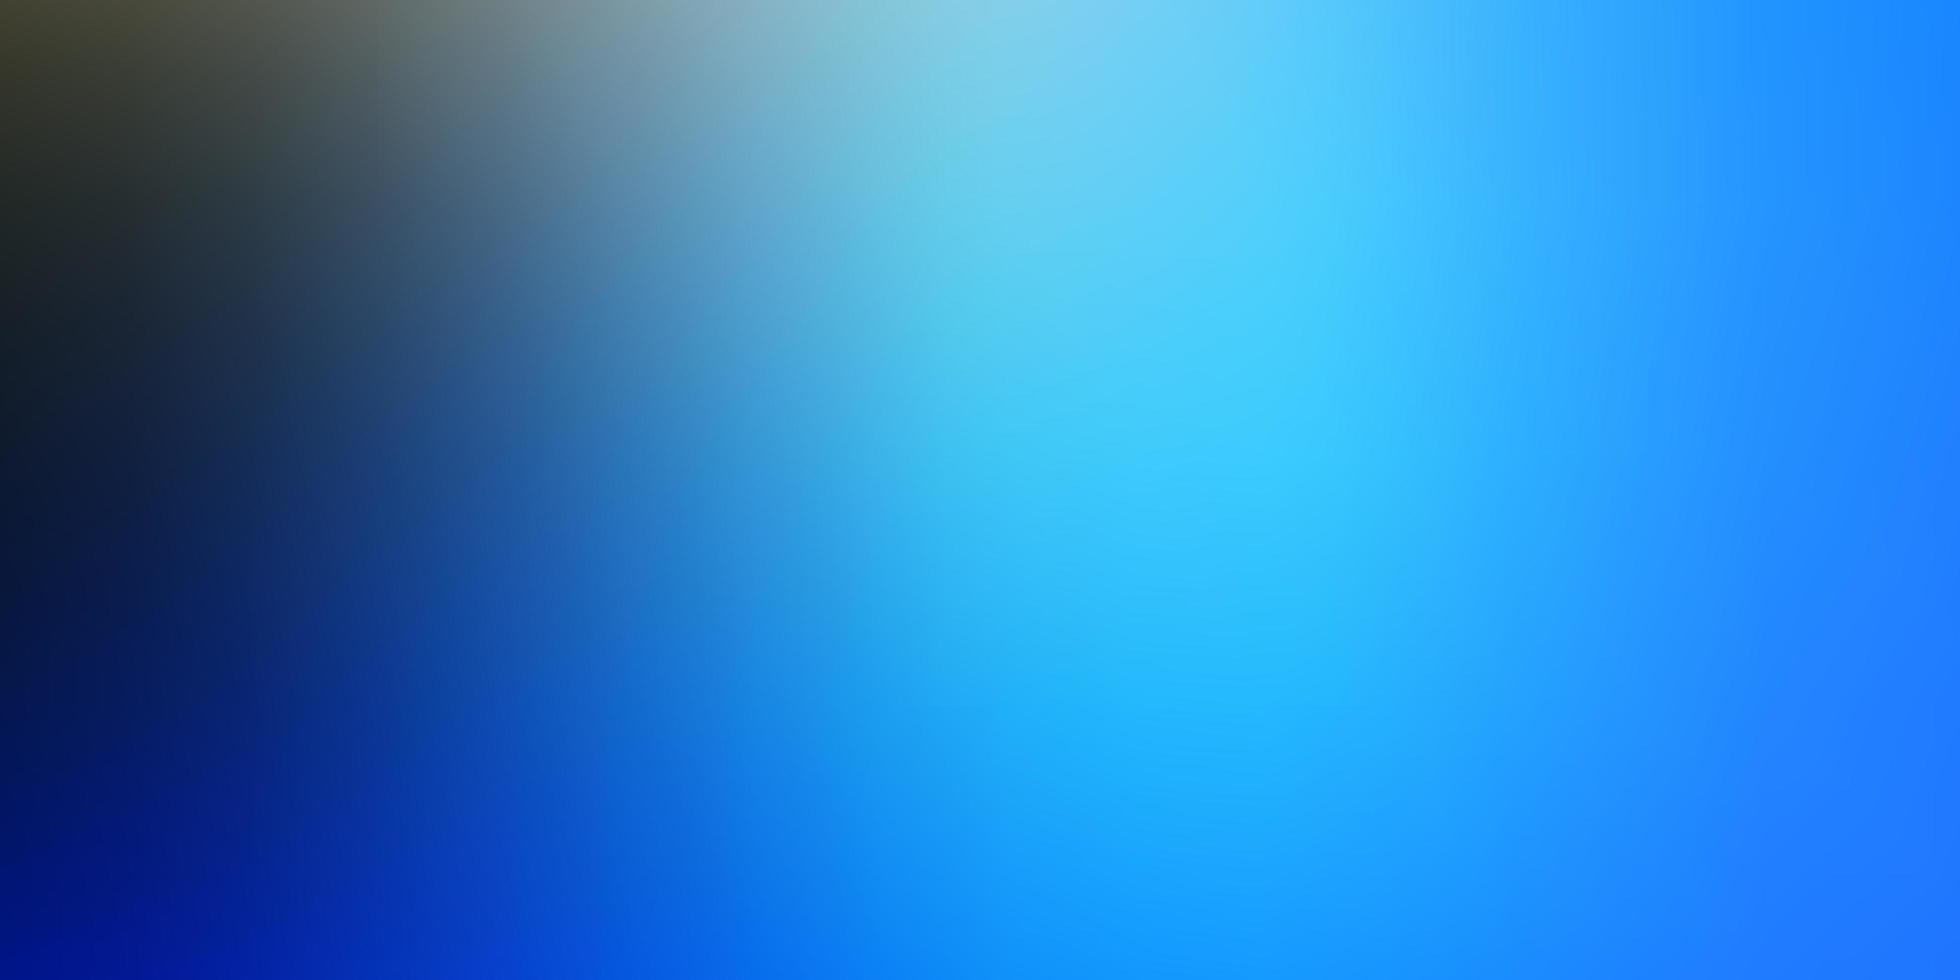 plantilla brillante abstracta azul. vector